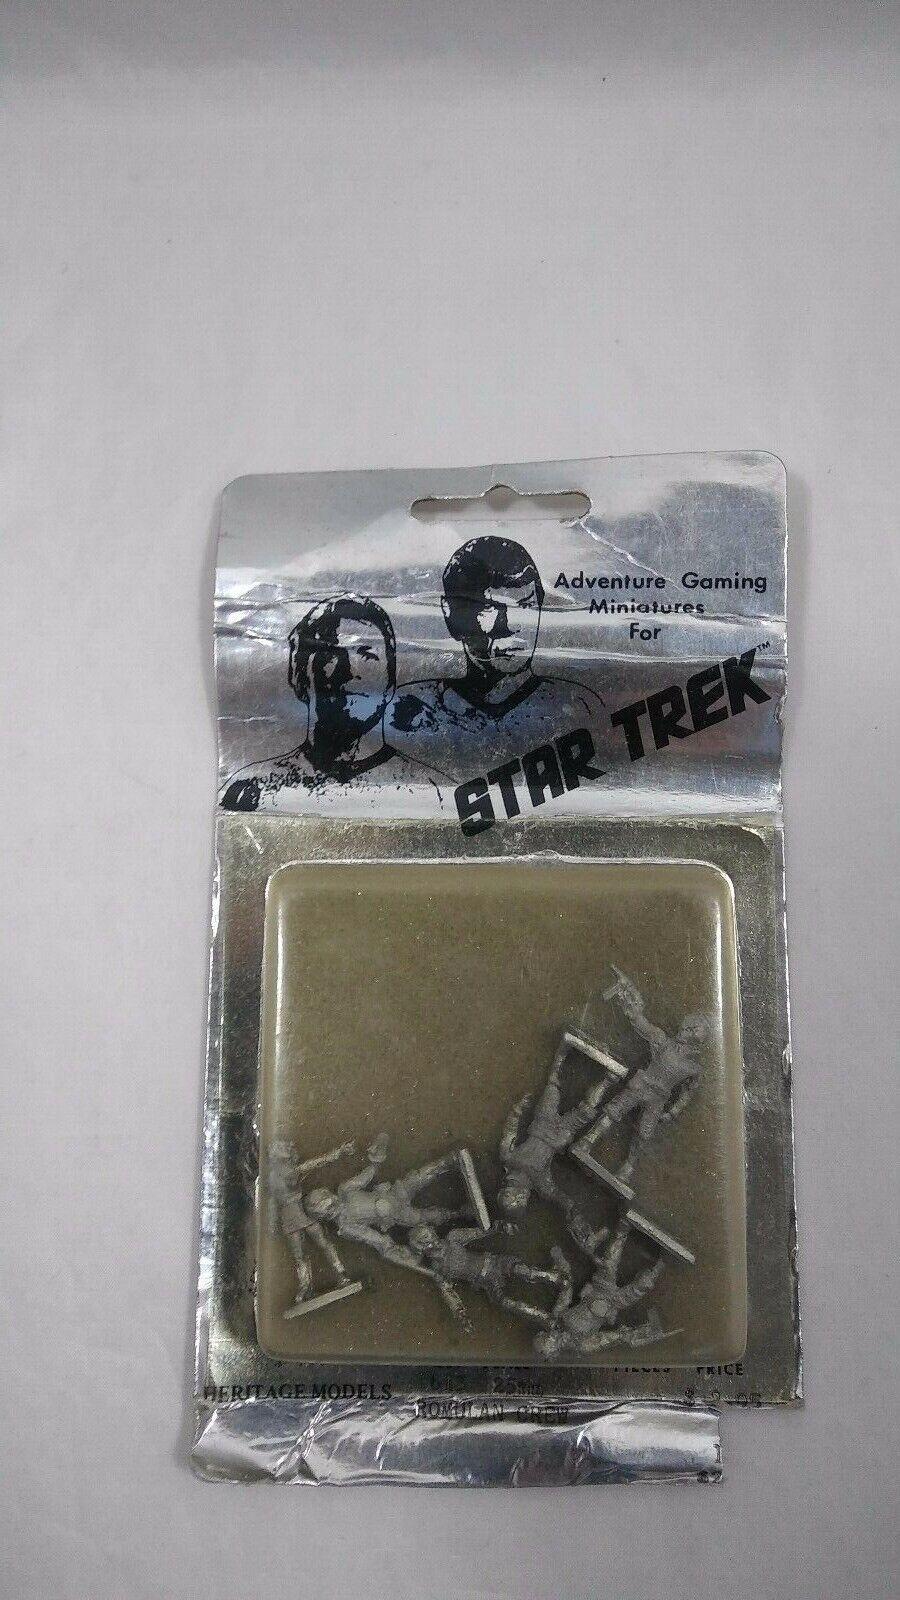 Heritage Models STAR TREK ROMULAN CREW Adventure Gaming Miniatures NOS SEALED